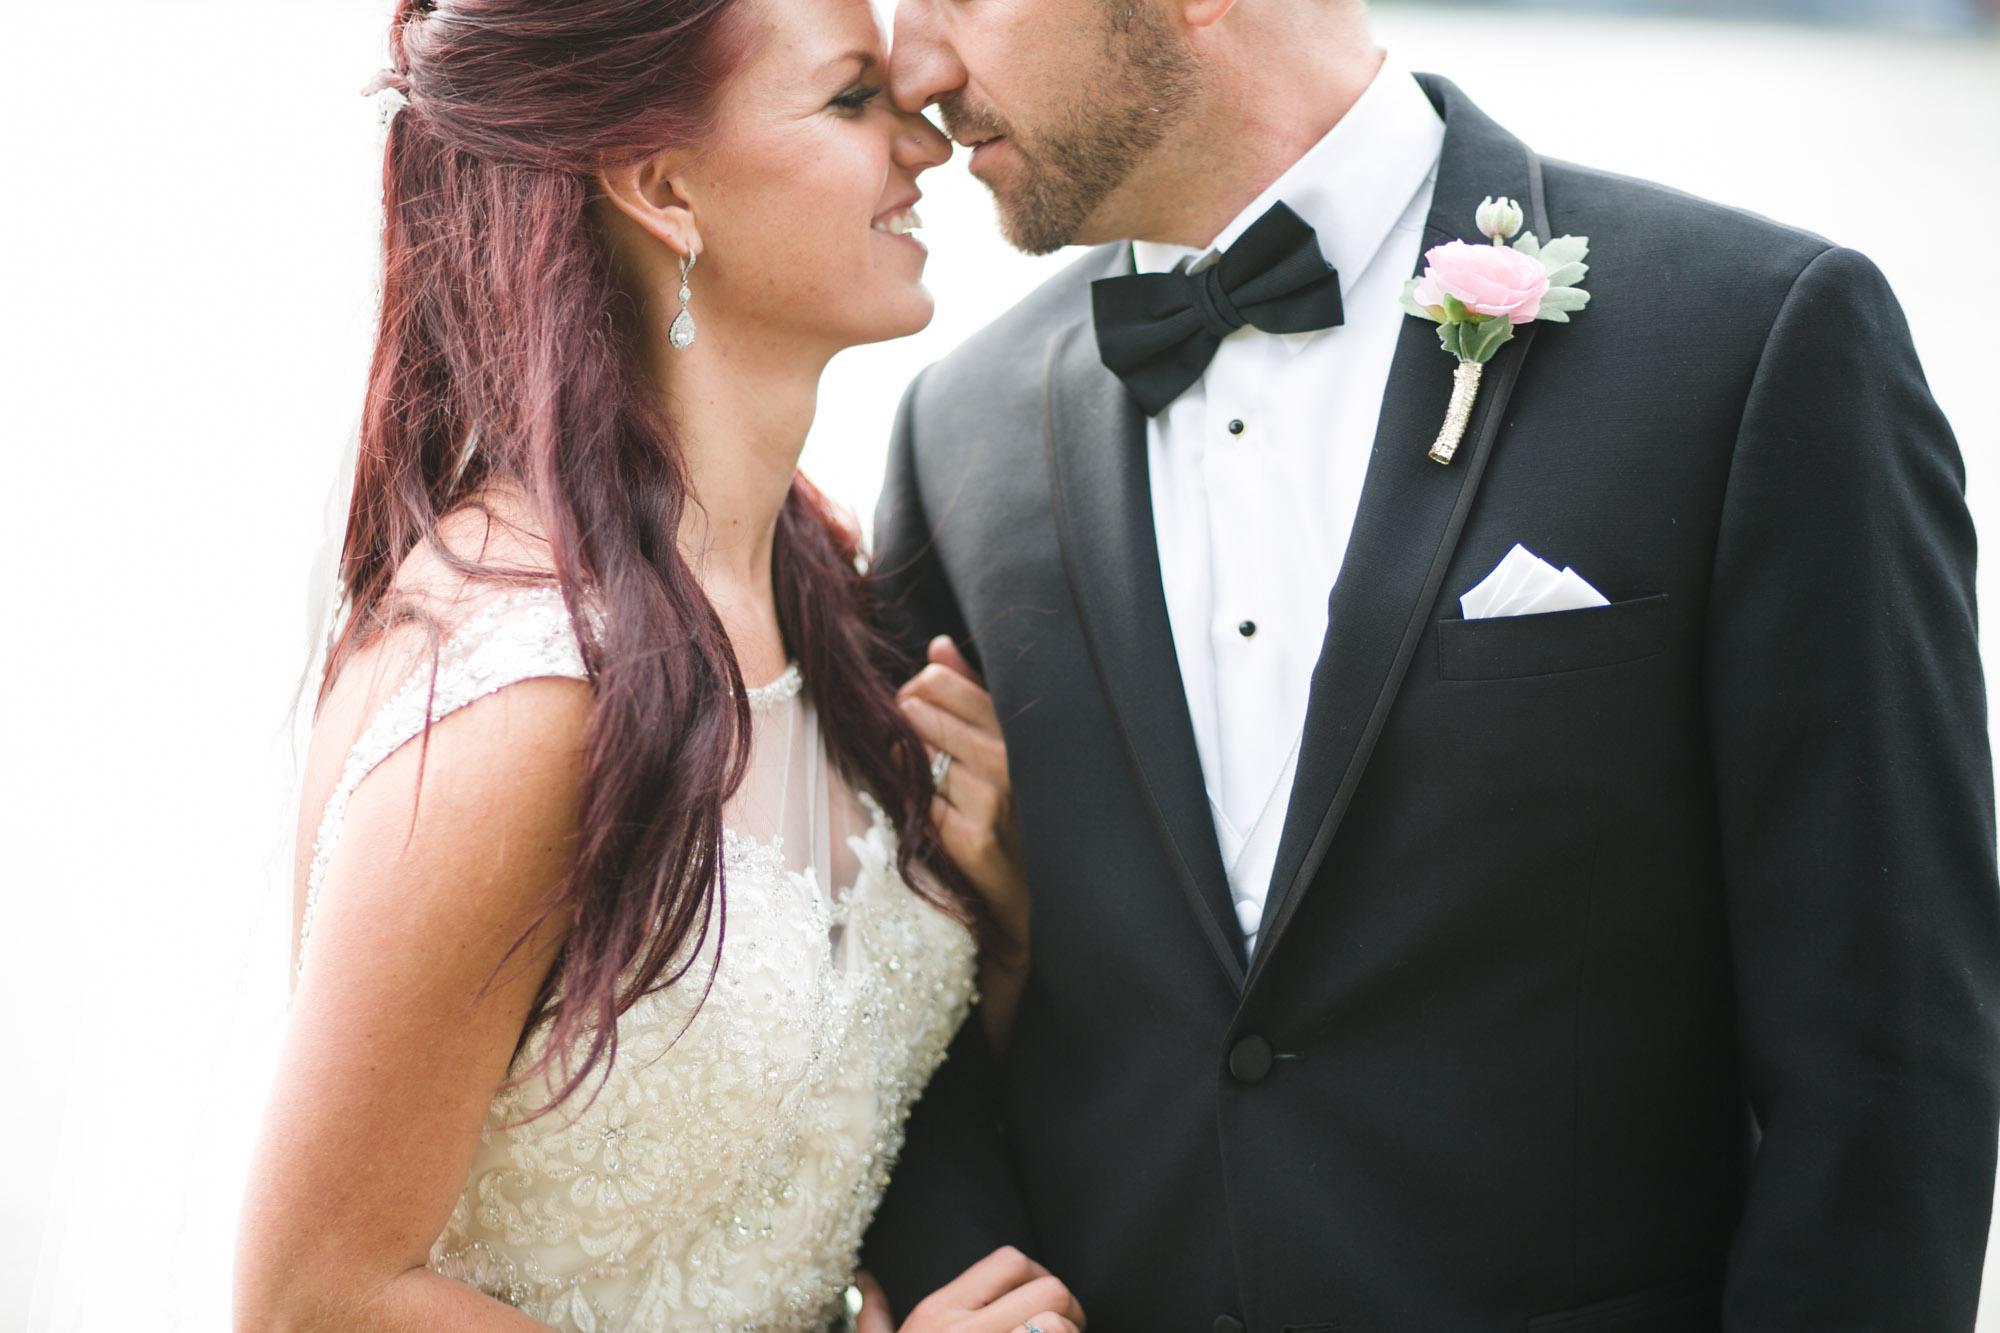 hensville-wedding-downtown-toledo-ohio (69 of 103).jpg